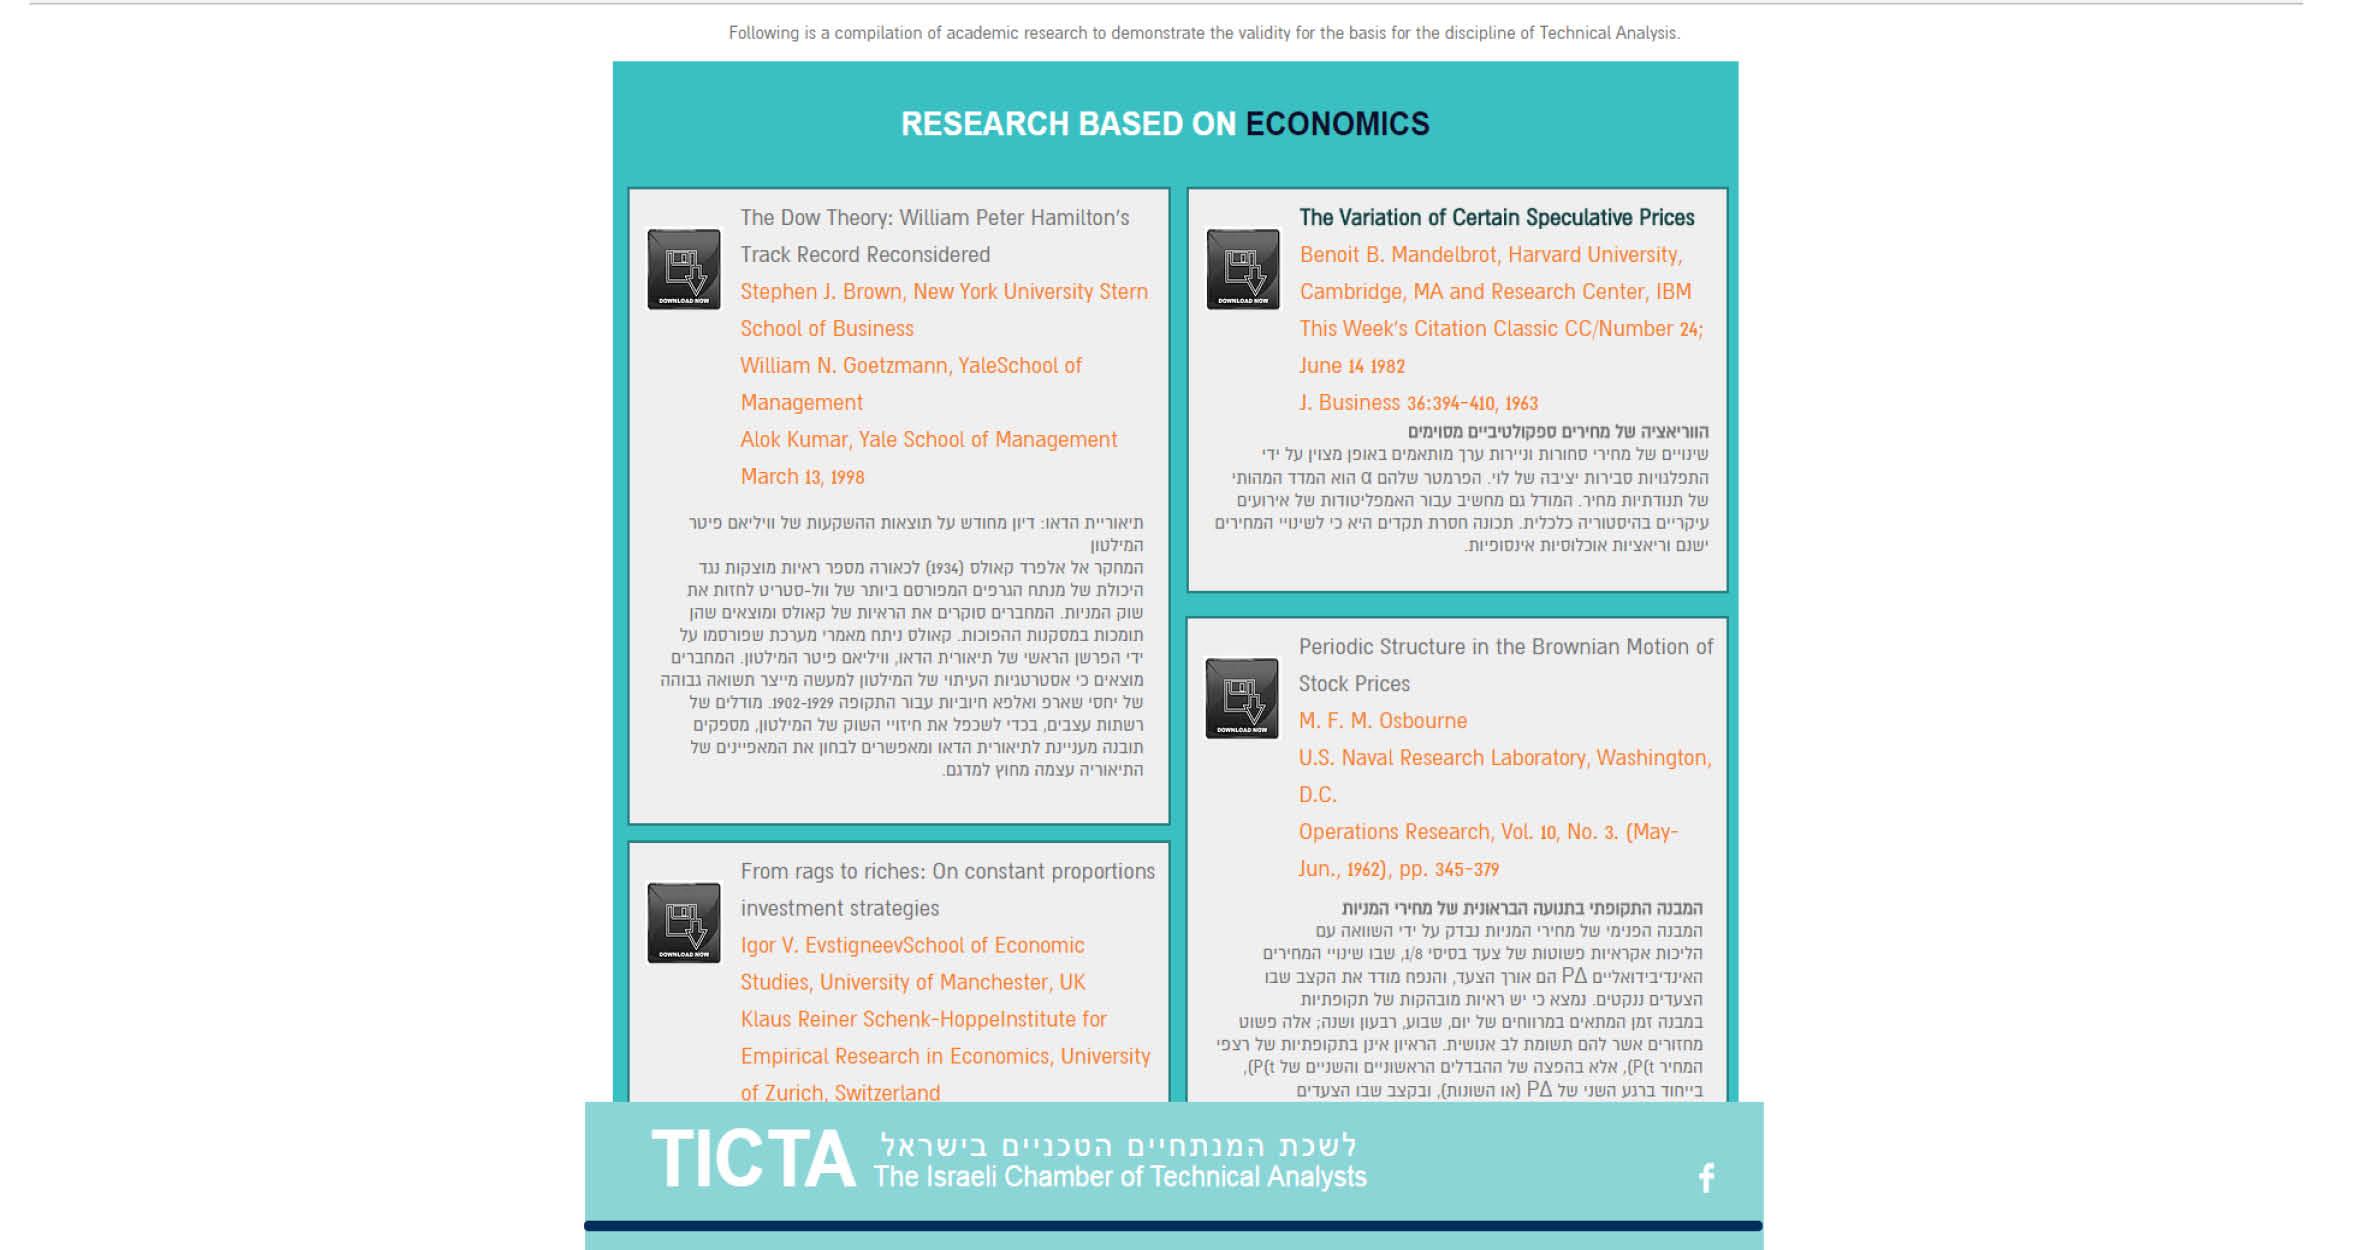 ticta2